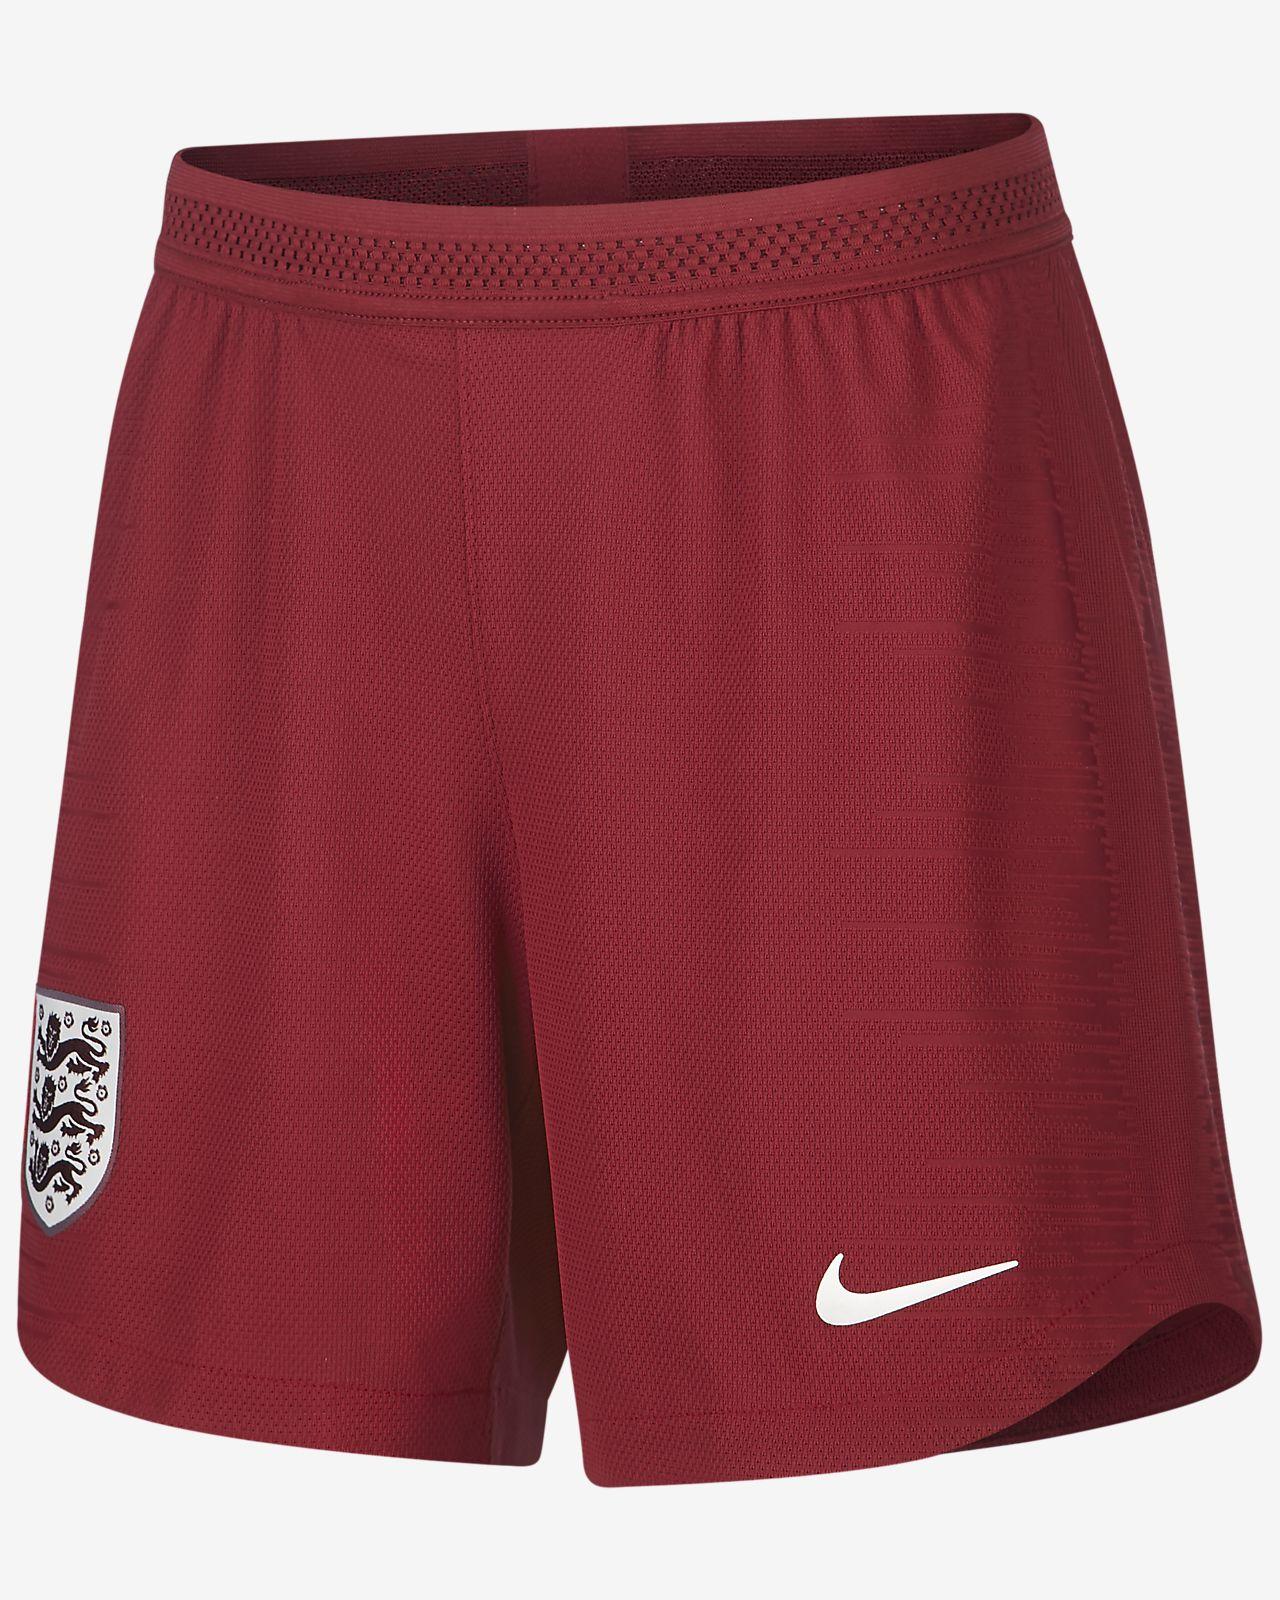 Shorts da calcio England 2019 Vapor Match Away - Donna